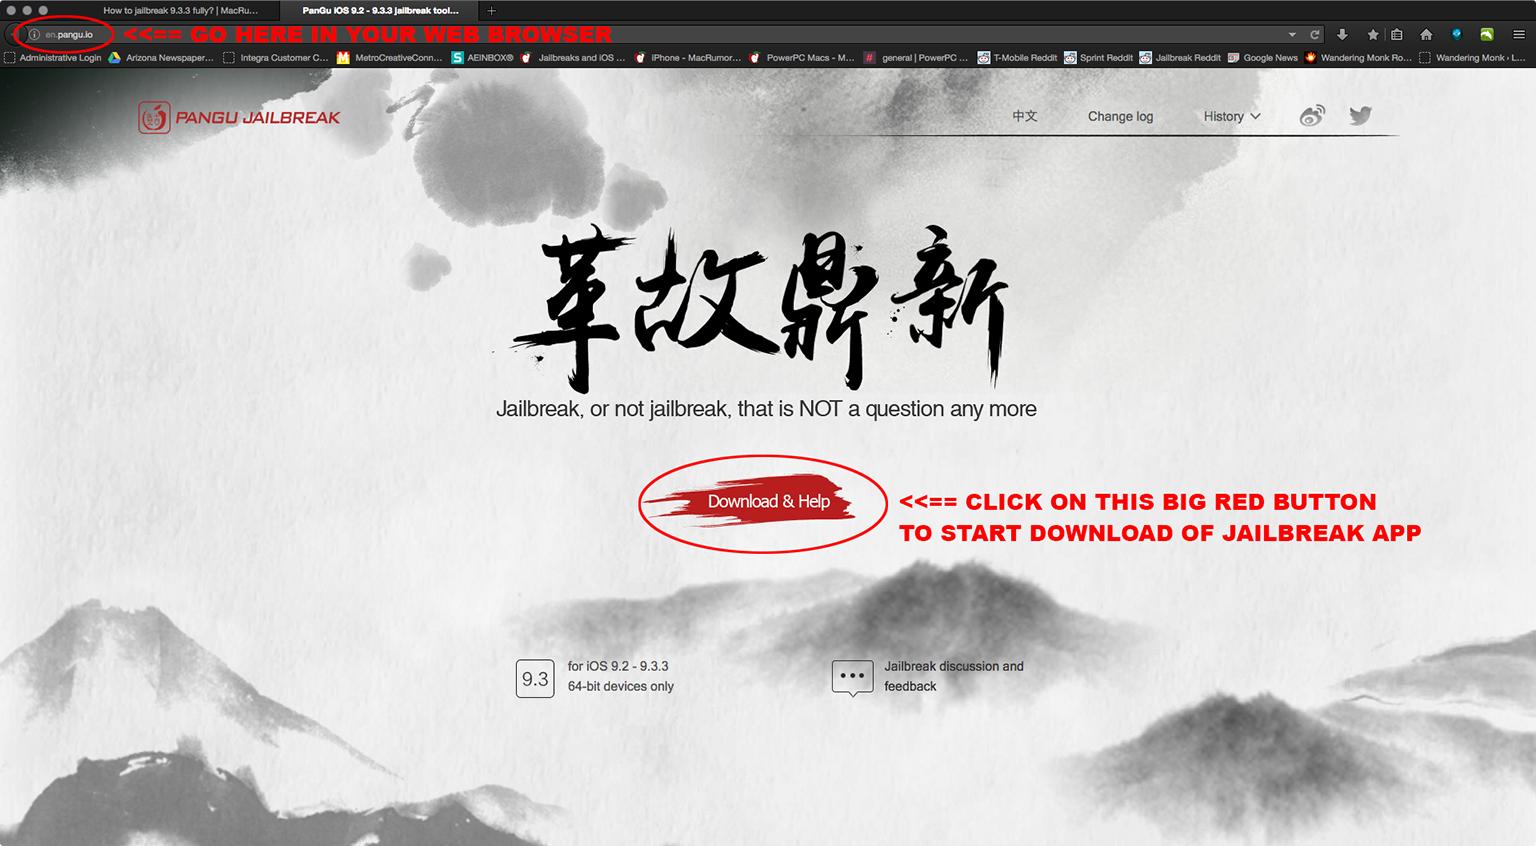 PanGu iOS 9.2 - 9.3.3 jailbreak tool - pangu.io.png